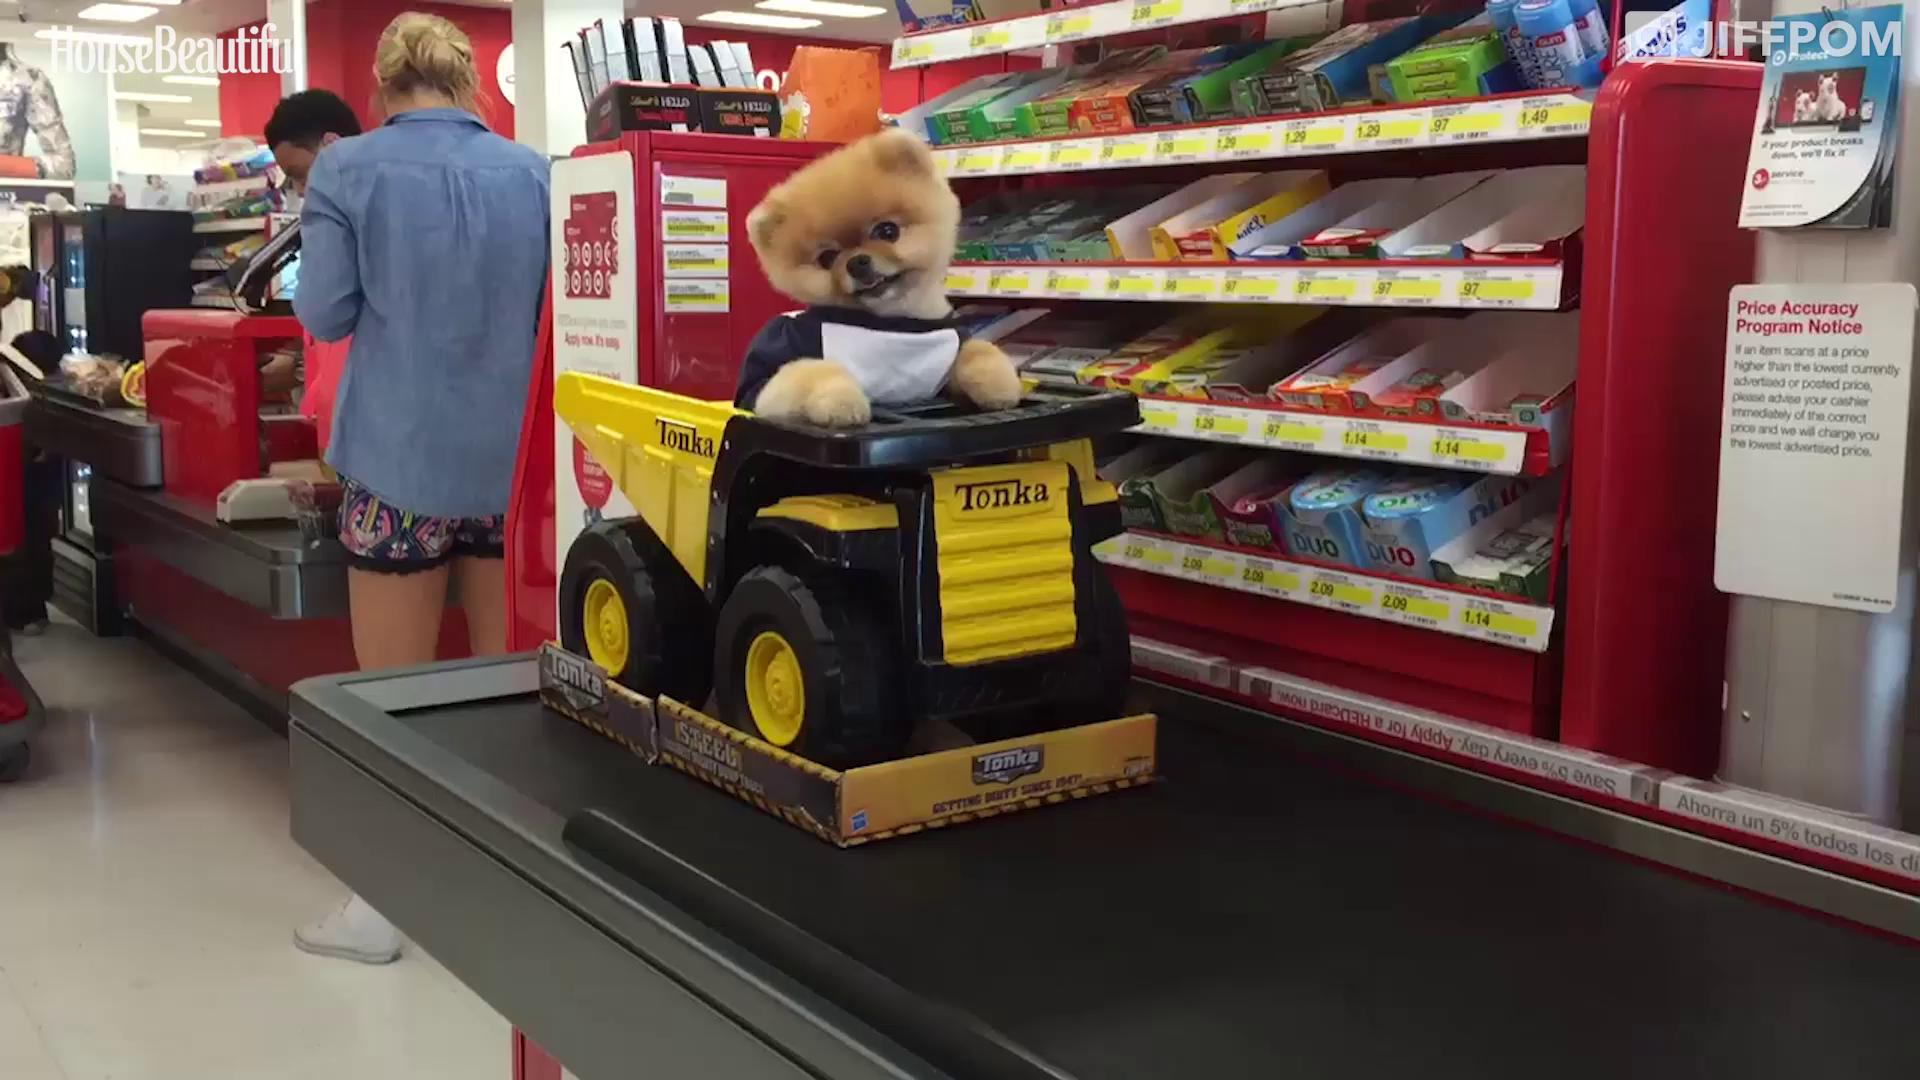 Internet, meet Jiff — the cutest dog in the world. https://t.co/yefkJxP8dI